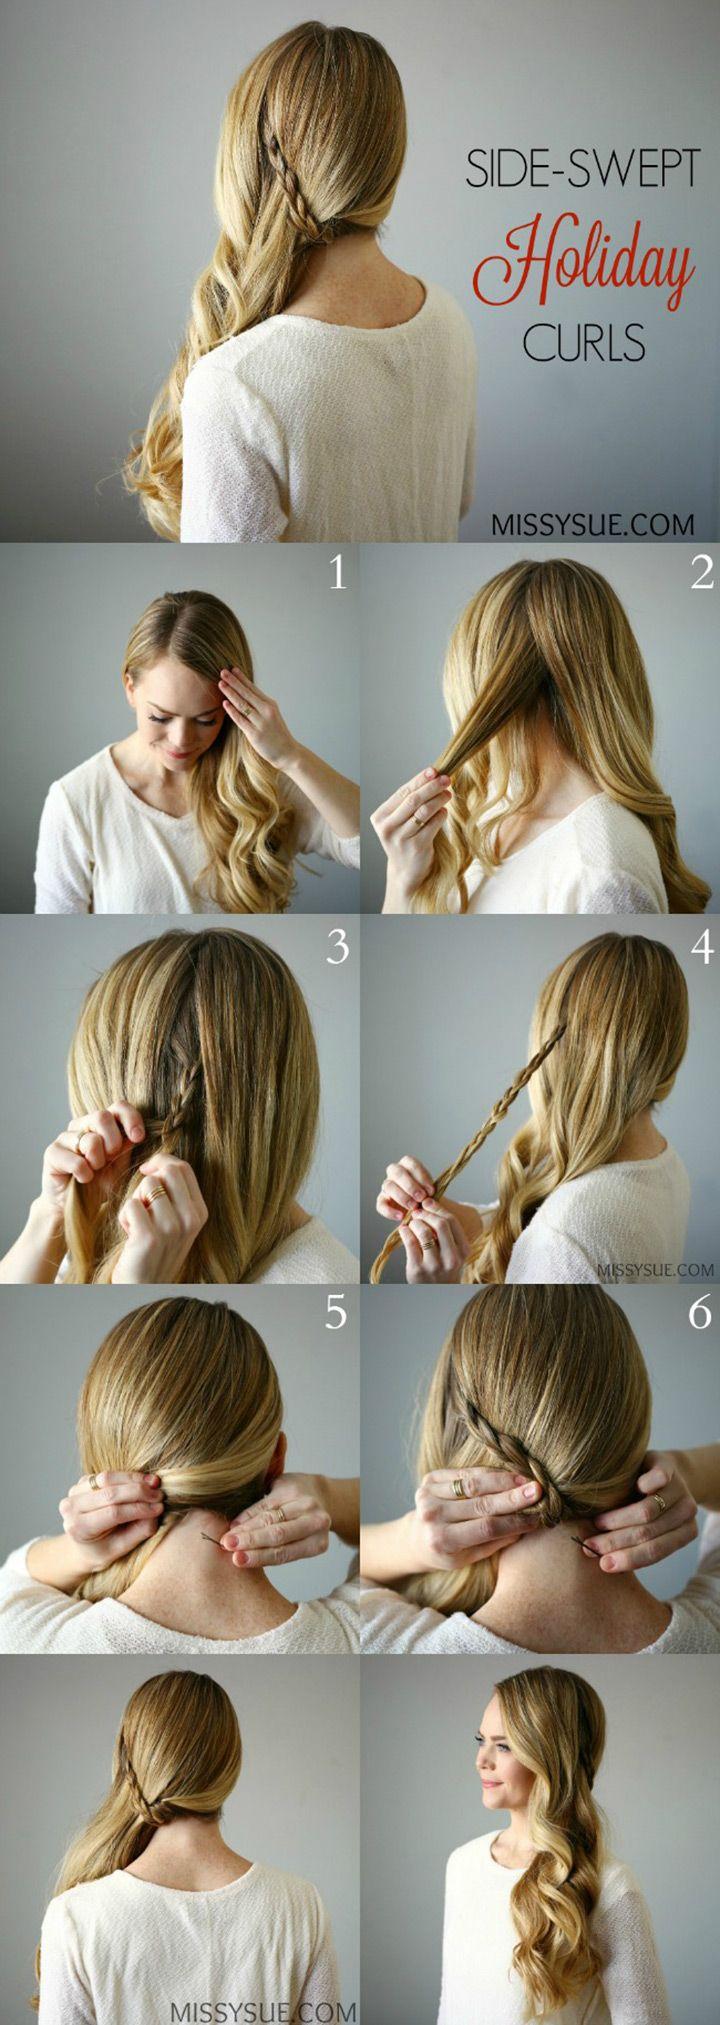 side swept curls with braid